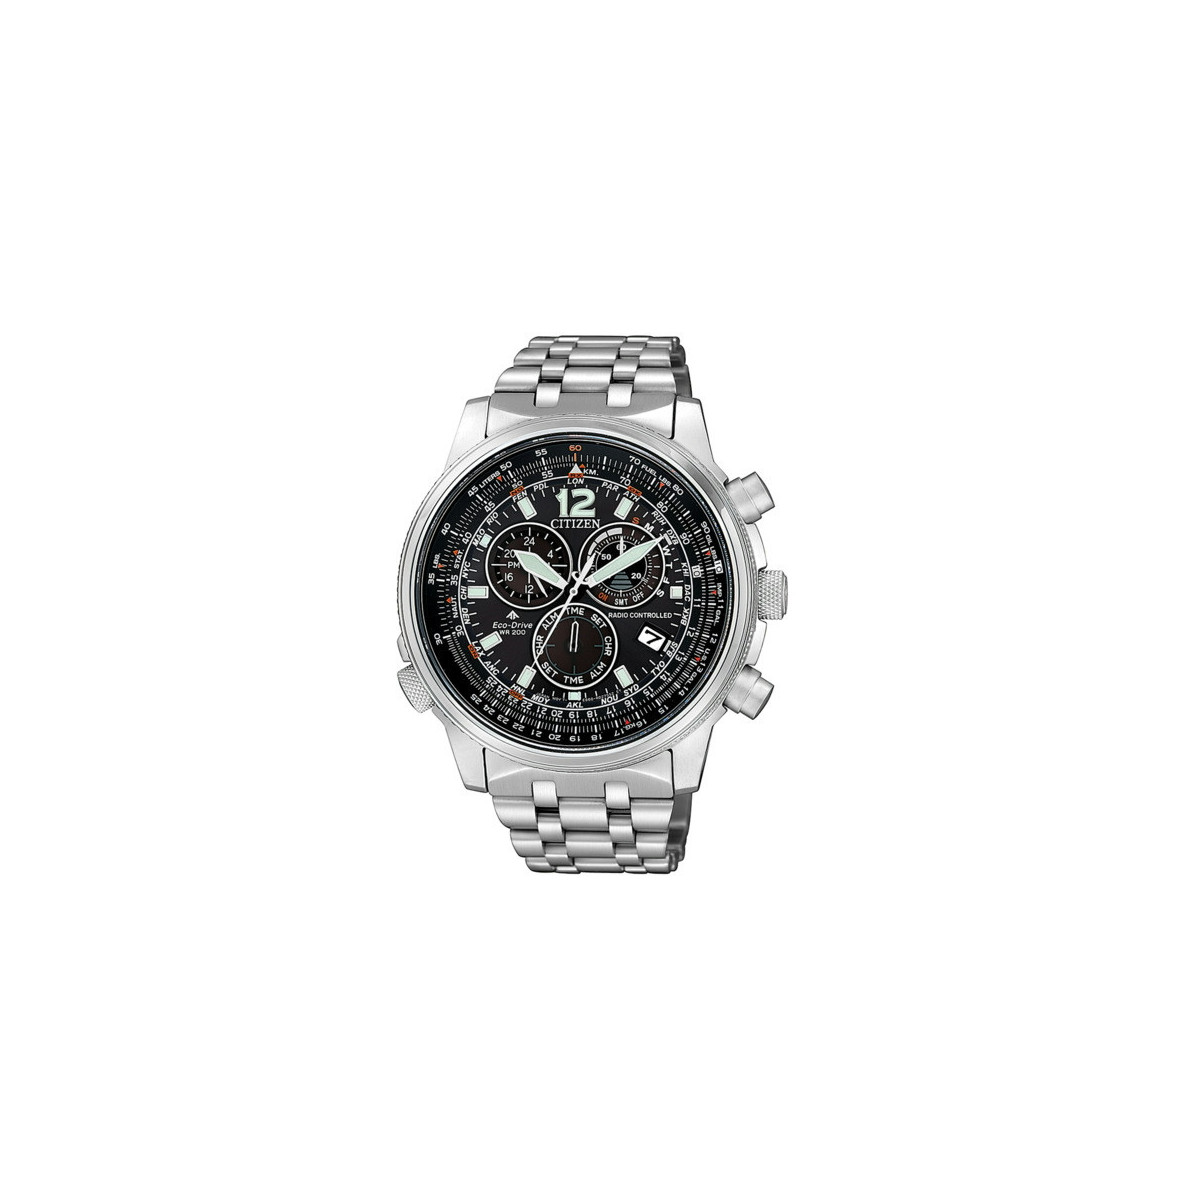 Reloj Citizen Crono Pilot E660 Radiocontrolado Hombre CB5860-86E